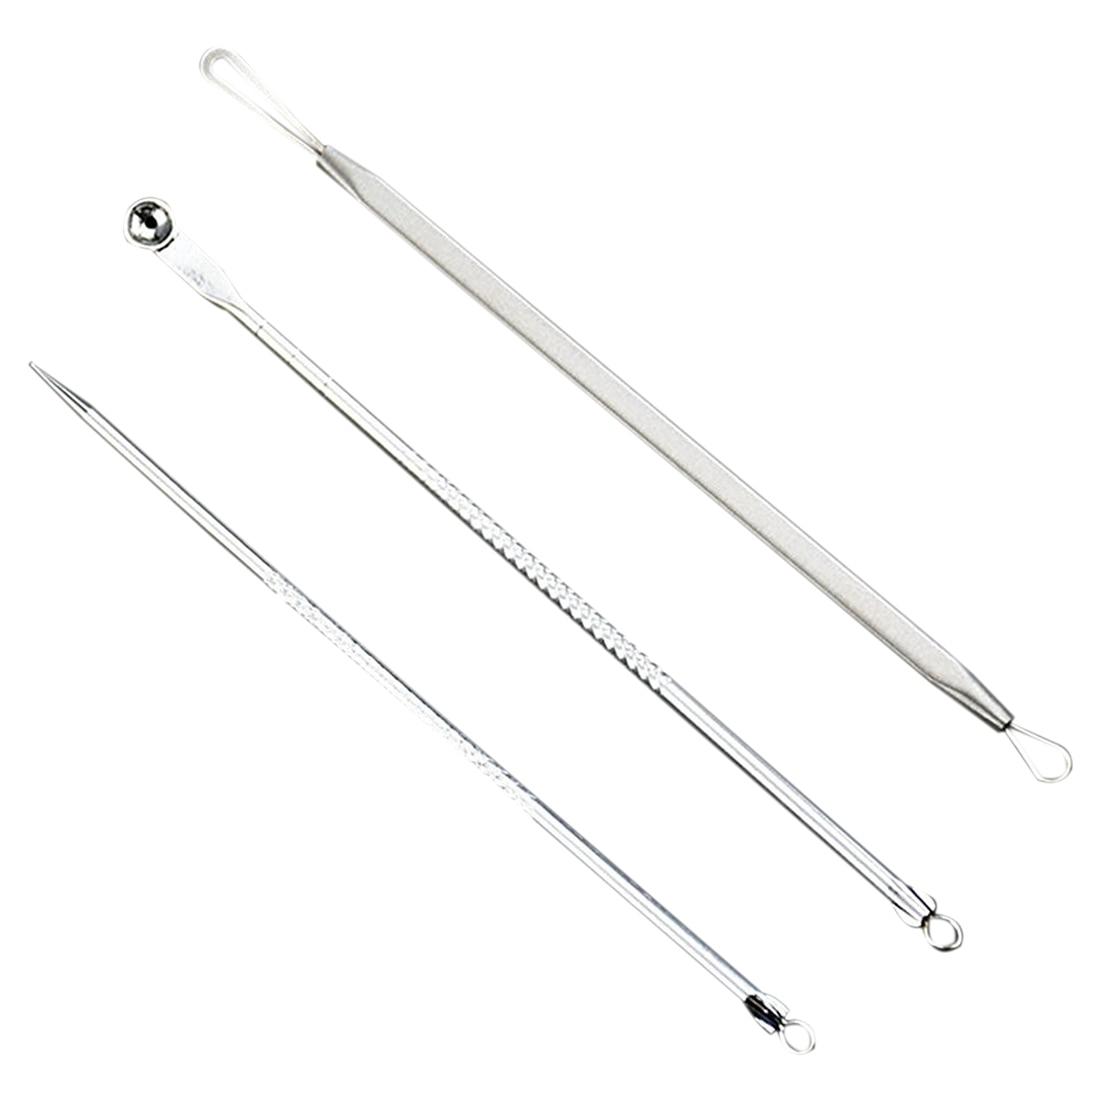 Stainless Steel Blackhead Pickel Spot Extractor Remover Tool Kit 3pcs Set